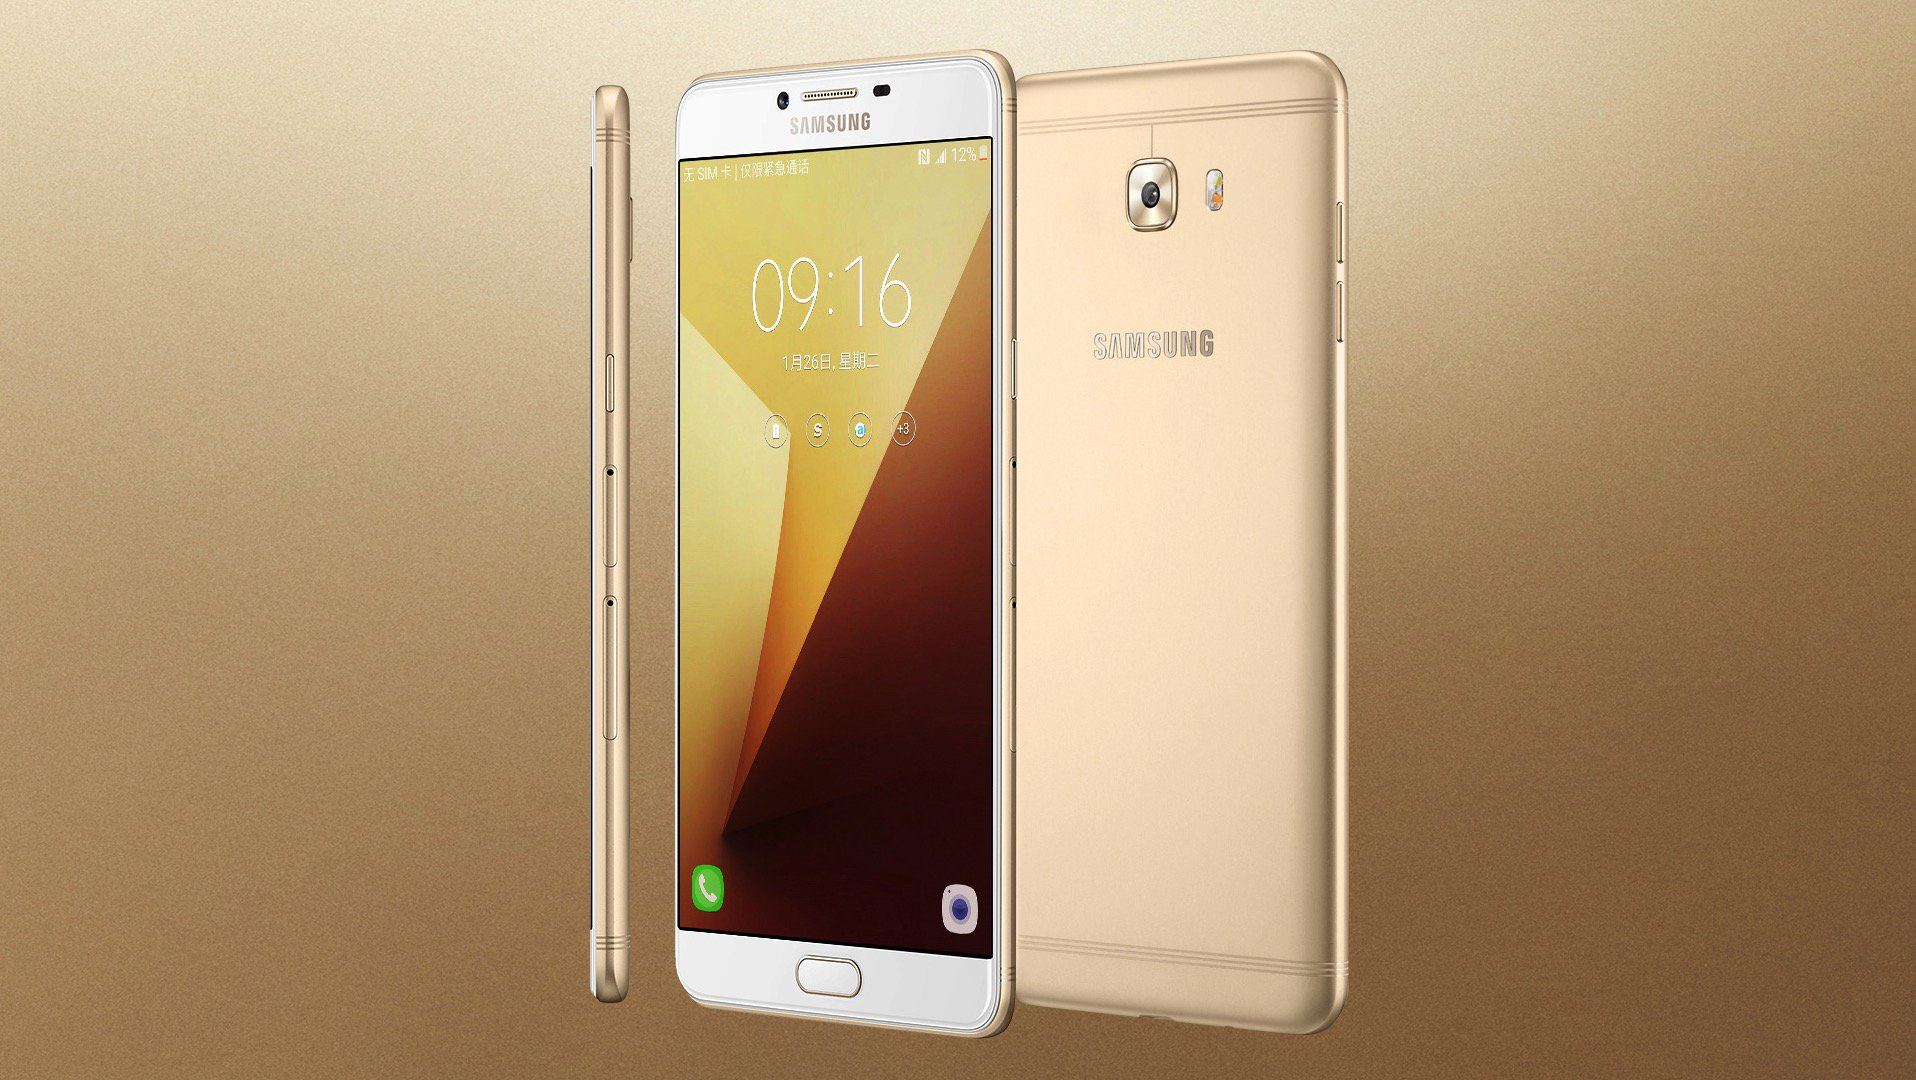 Tempat Jual Samsung Galaxy C9 Pro Smartphone Black 64gb 6gb Termurah Garansi Internasional 1 Tahun Launching In Nepal We Find The Aimed For